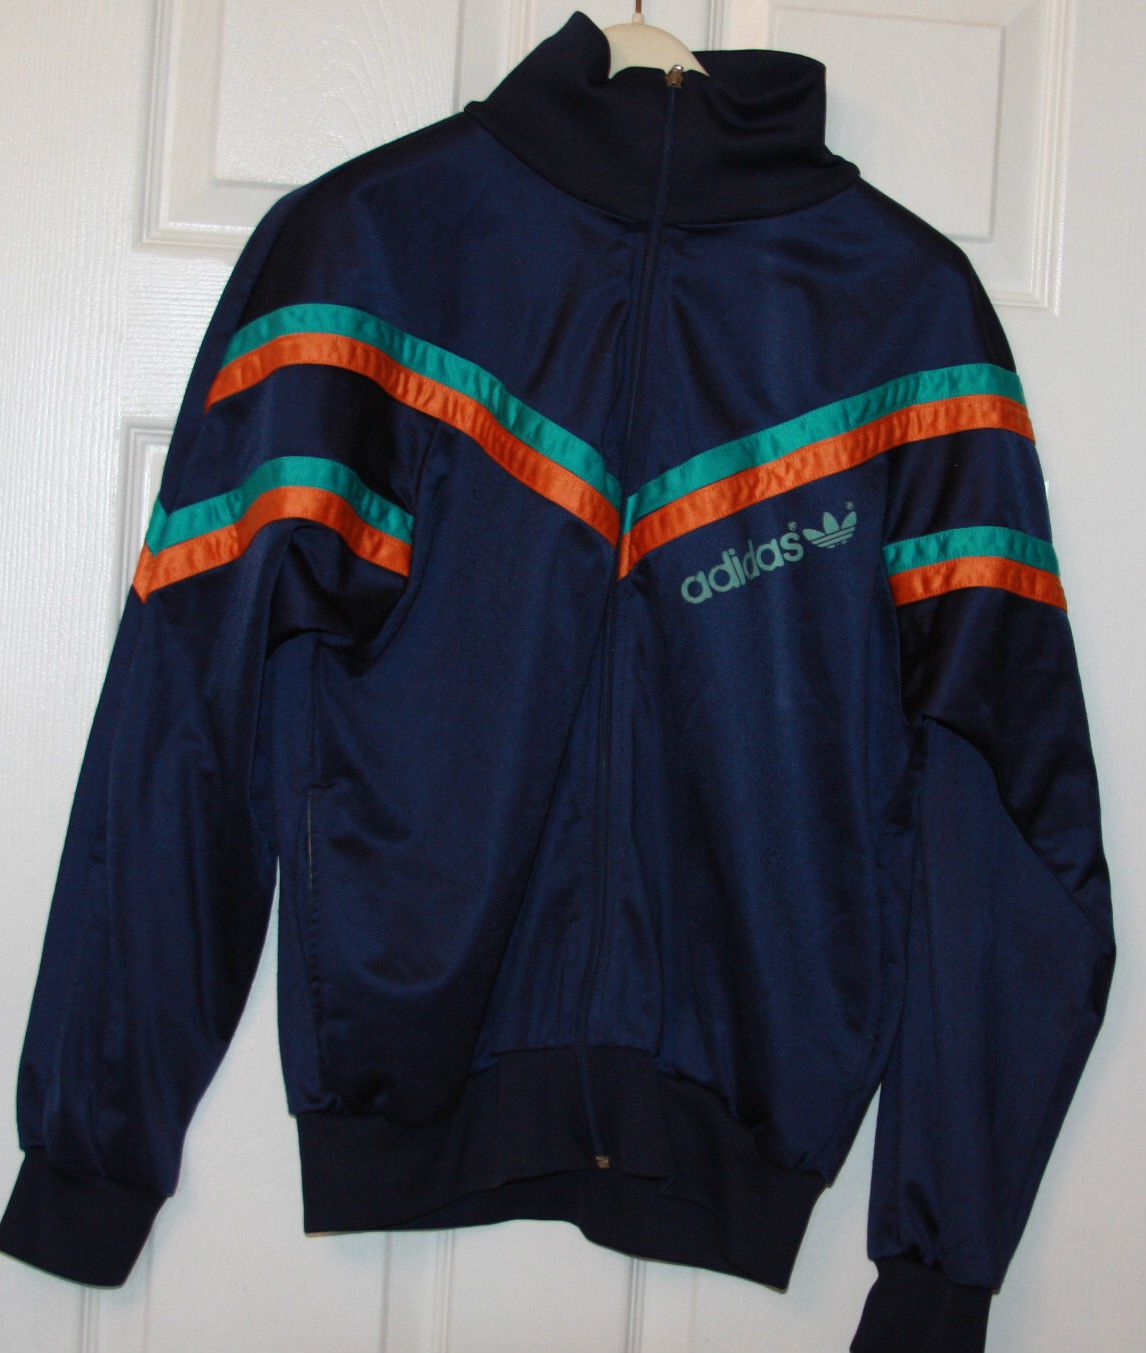 True Vintage 1980s 1990s Adidas Tracksuit Top Size 38 40